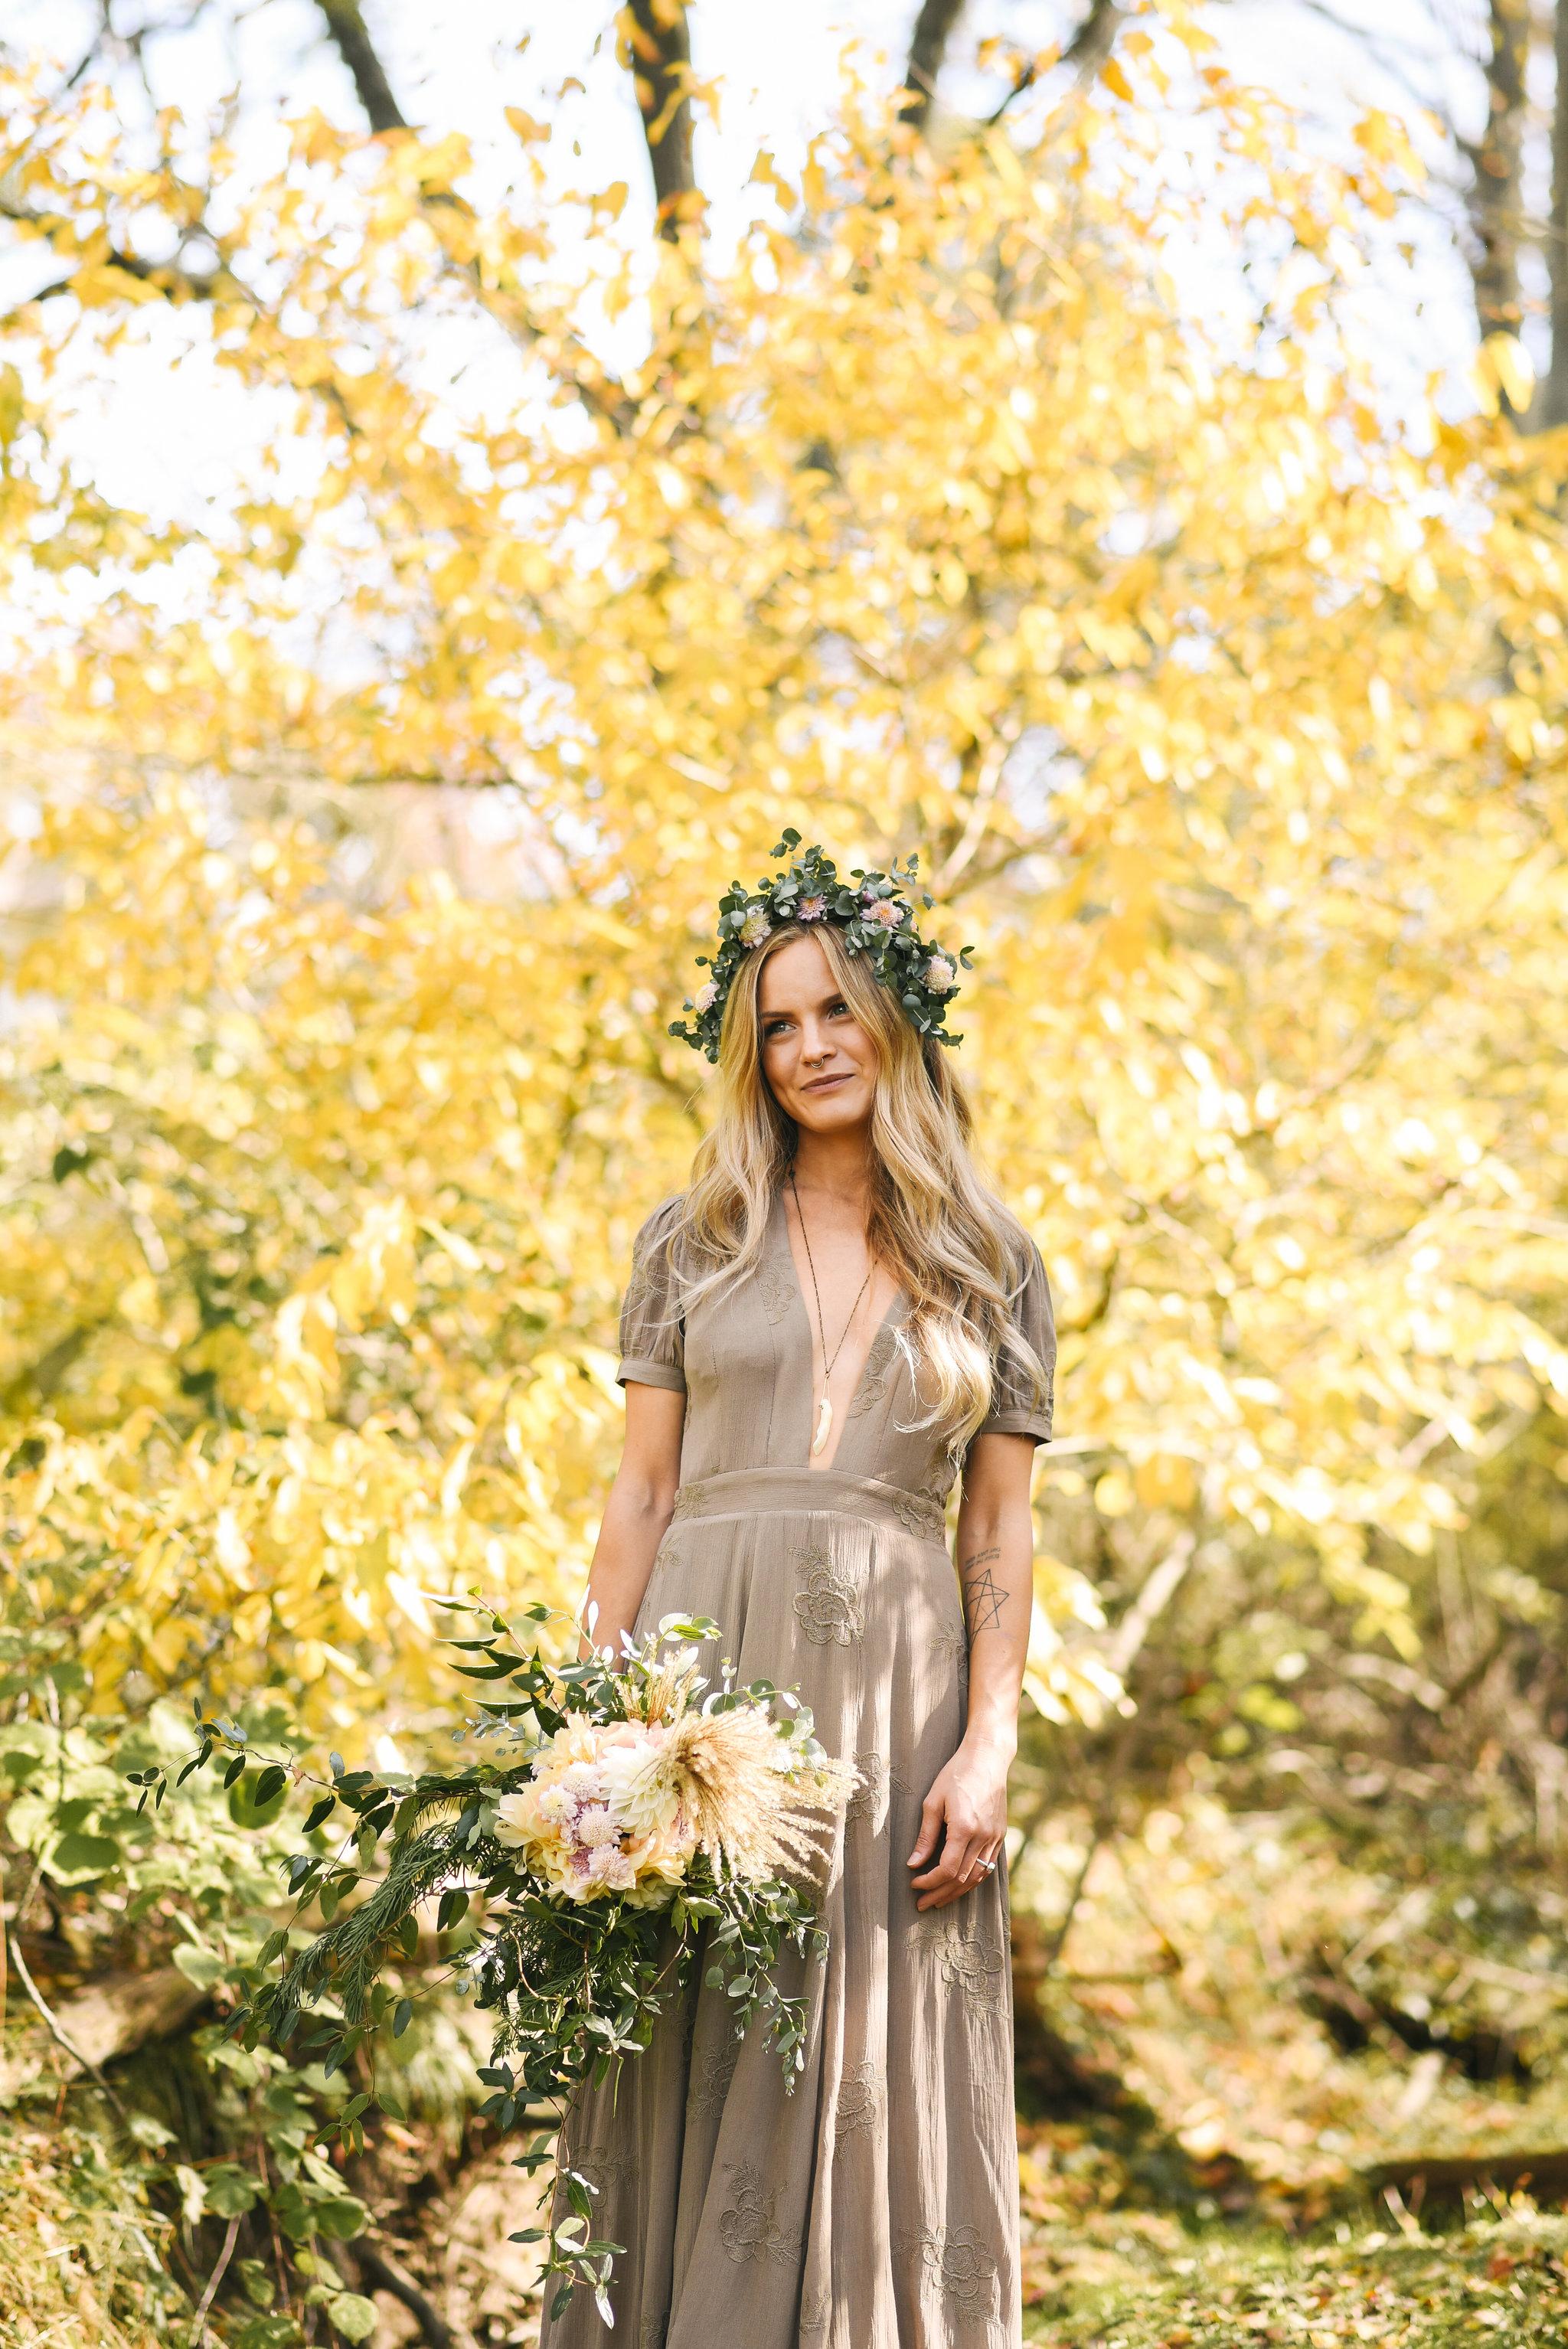 Baltimore, Maryland Wedding Photographer, Backyard Wedding, DIY, Rustic, Casual, Fall Wedding, Woodland, Butterbee Farm Flower Crown, Brightside Boutique Wedding Dress